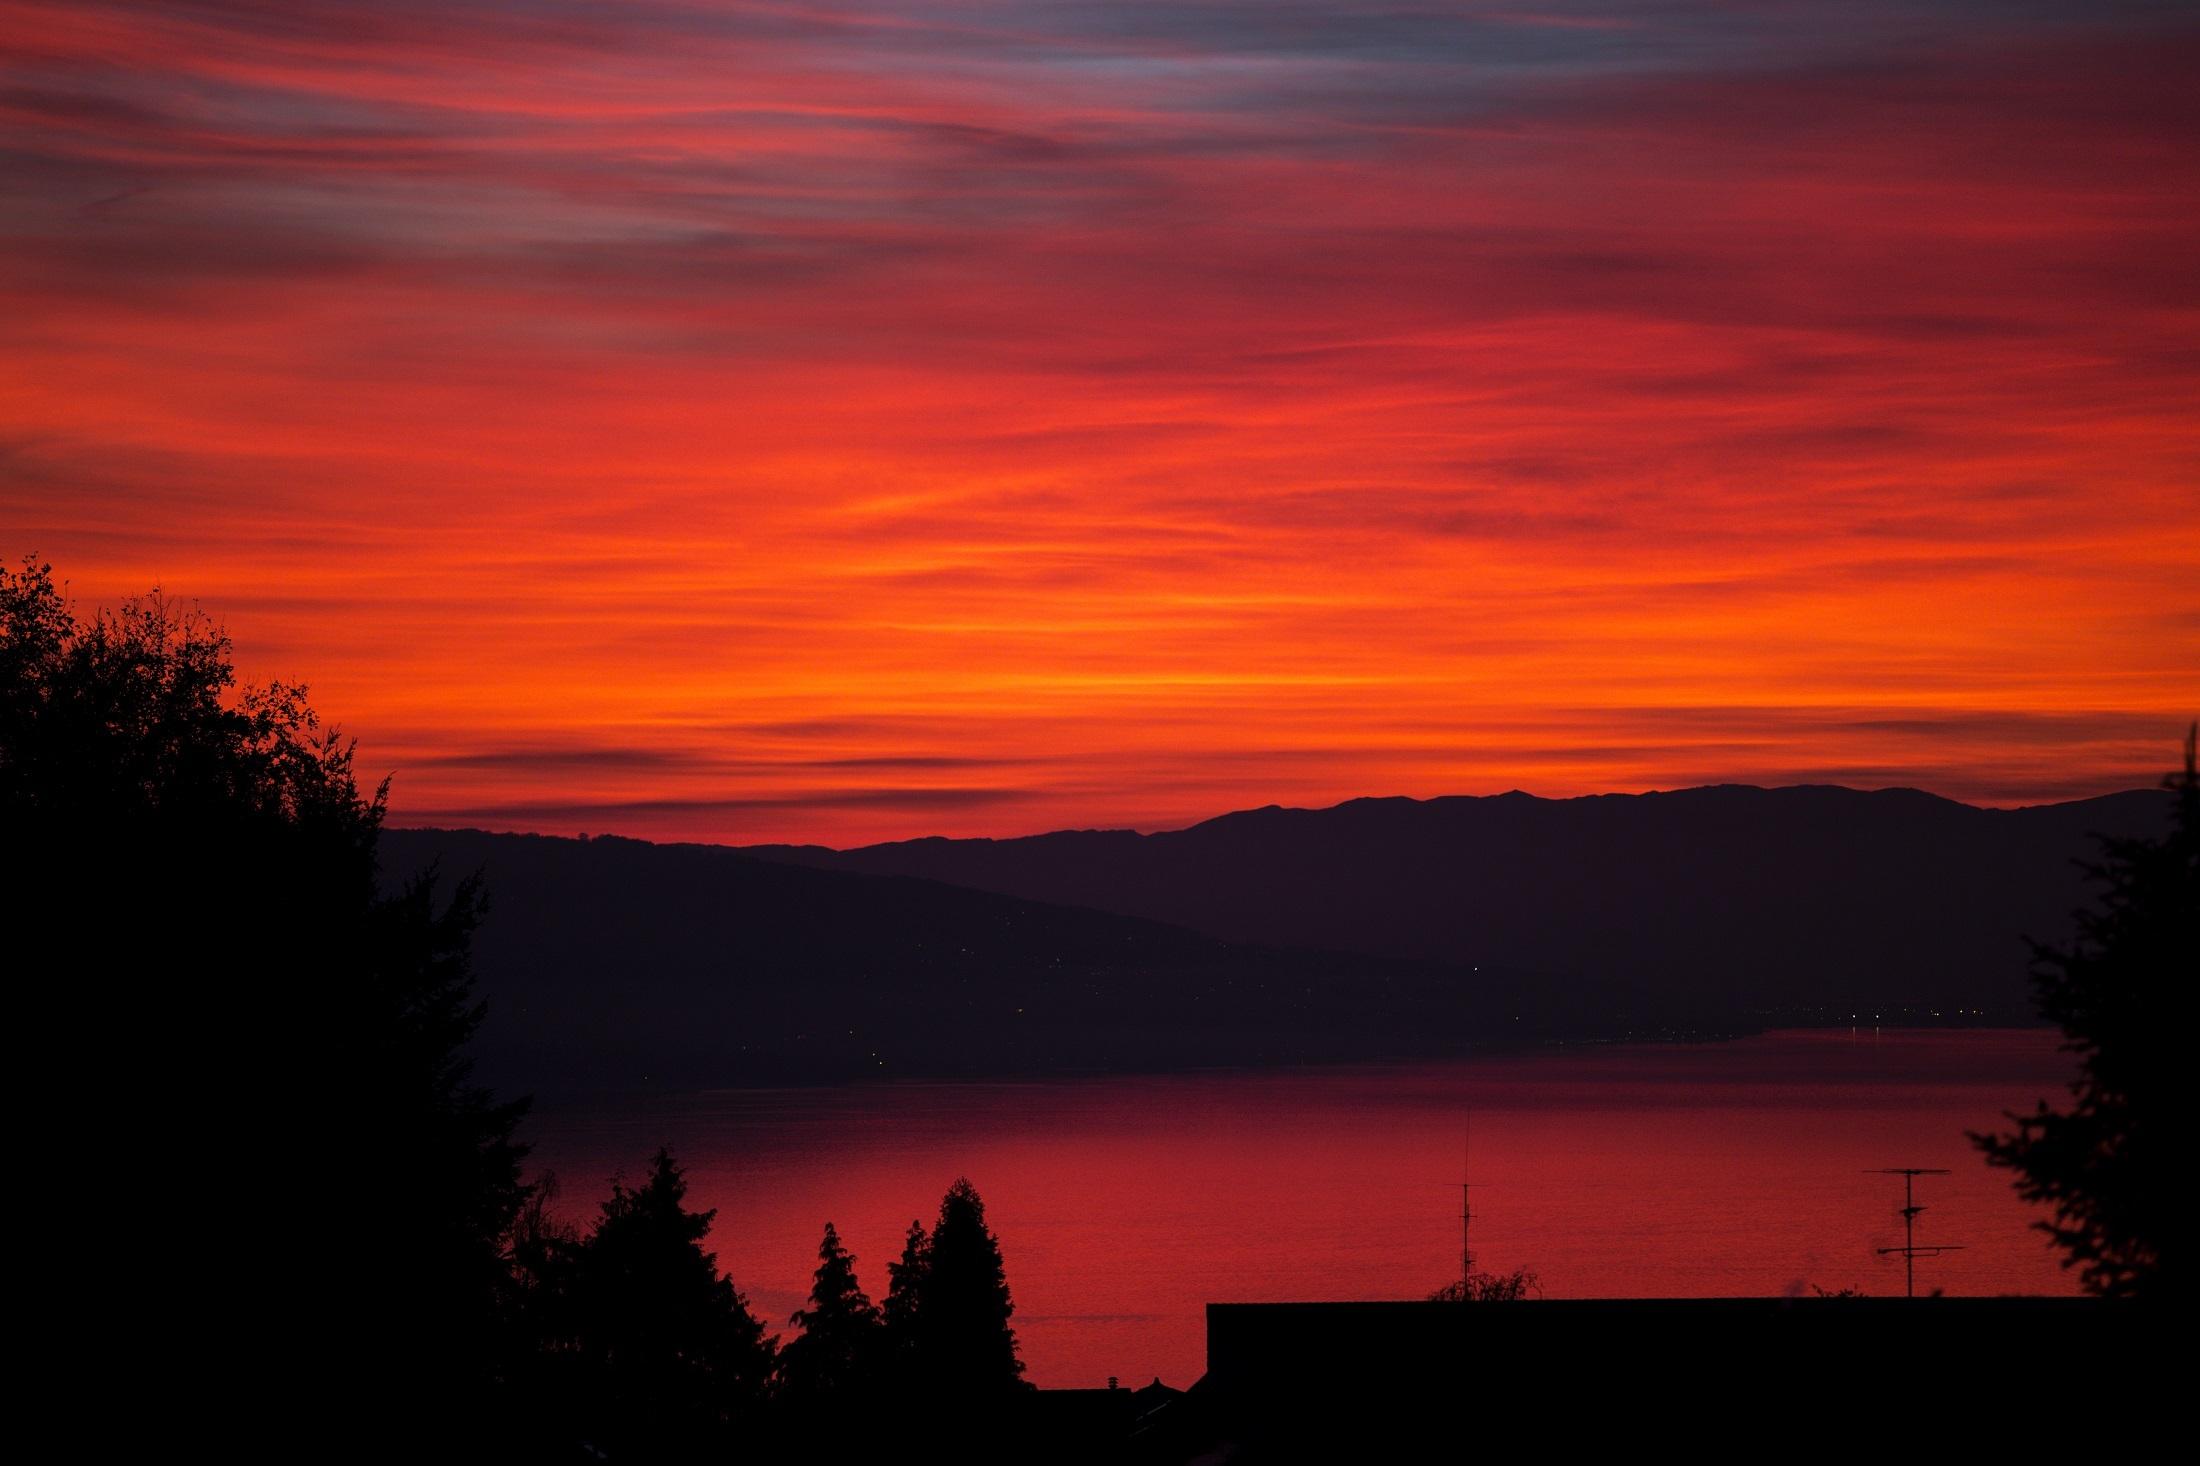 Red sunset photo